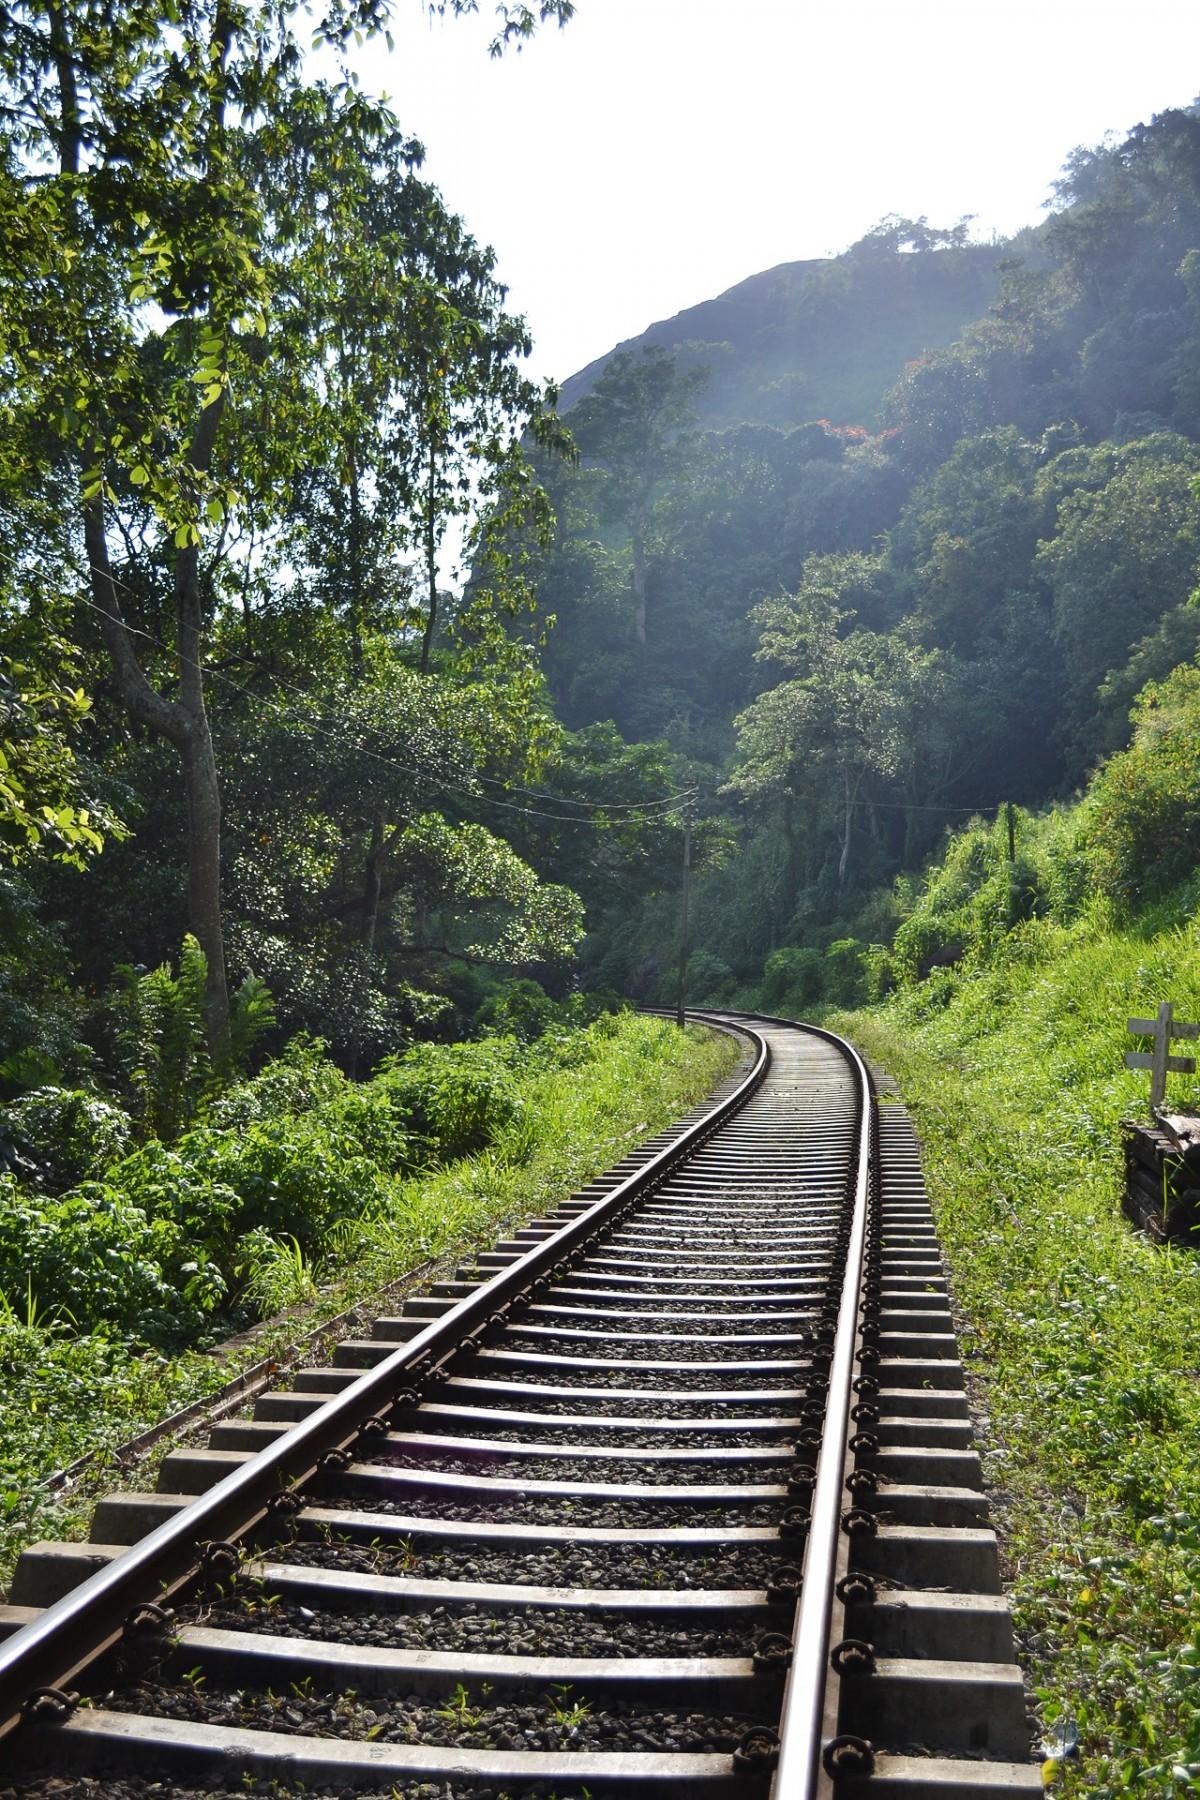 Hd Good Afternoon Wallpaper Free Images Track Railroad Bridge Night Rail Train